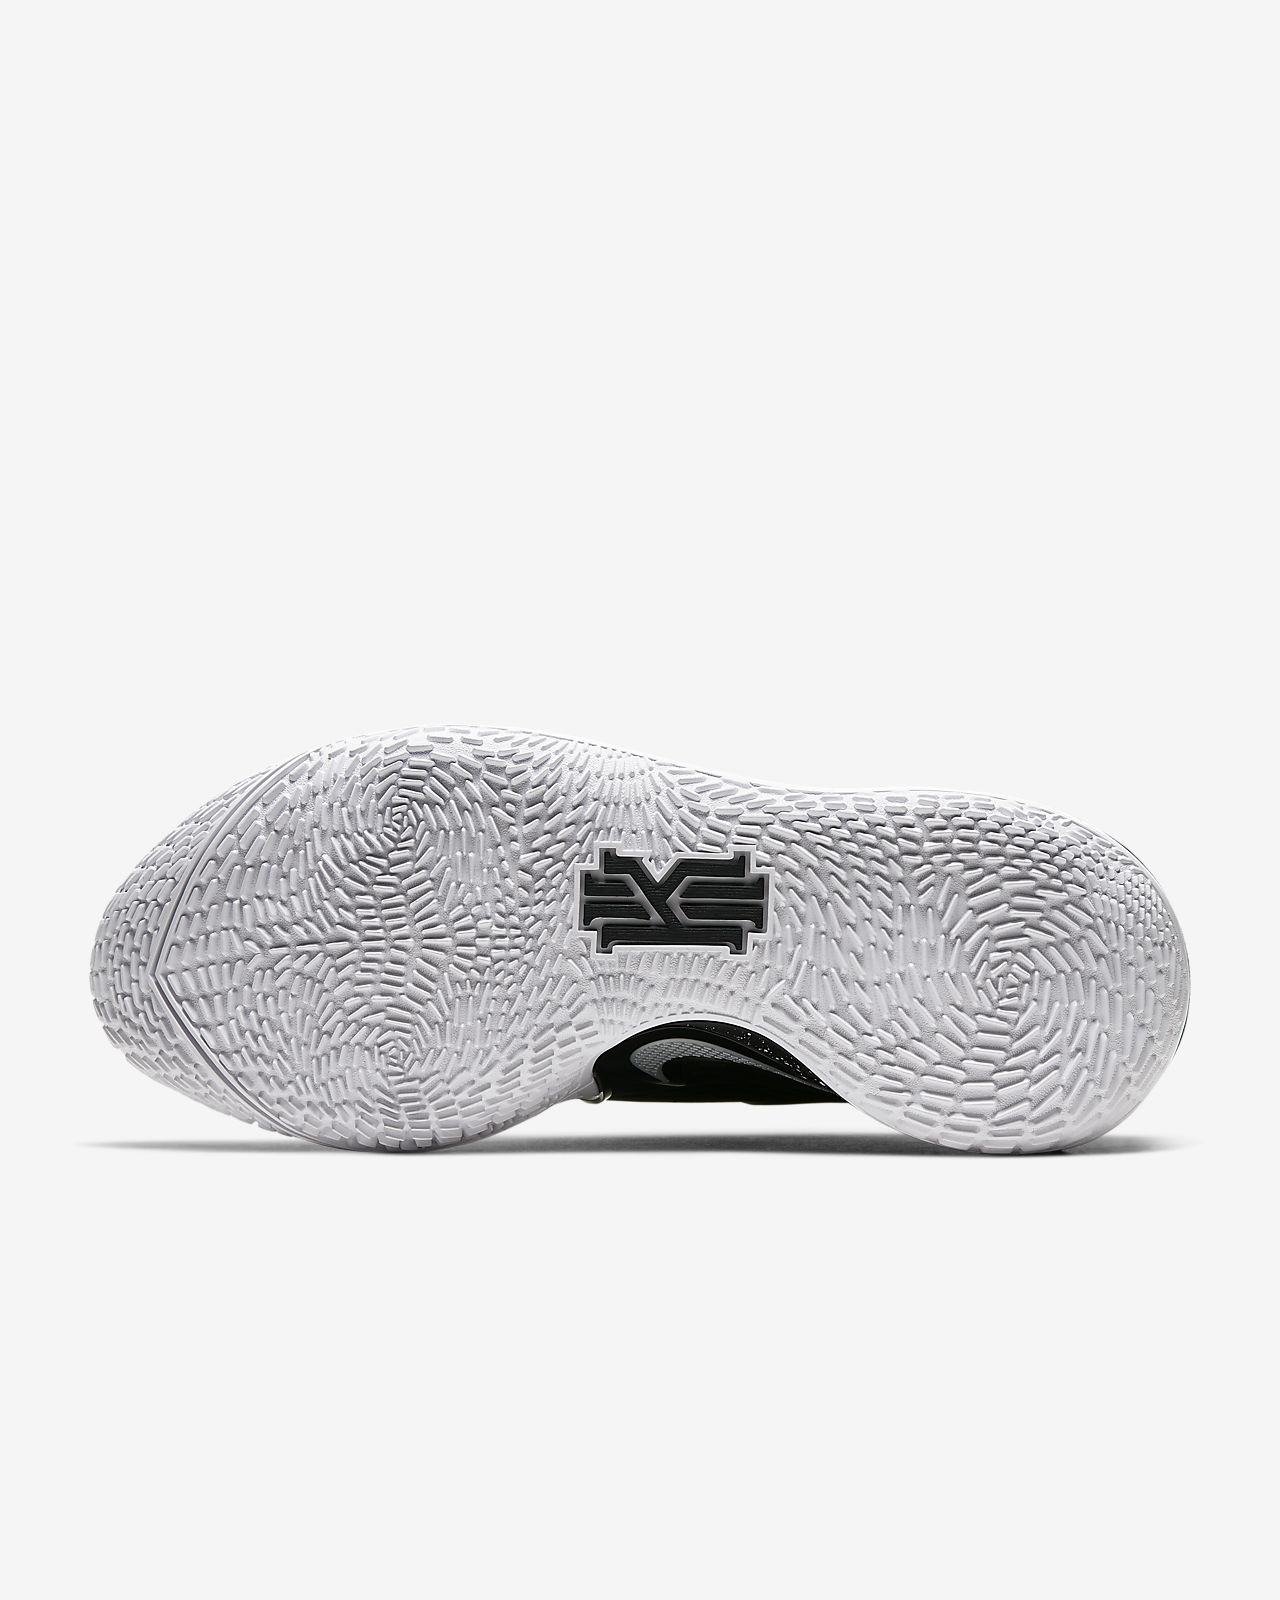 Herren Nike Kyrie 2 Schwarz Metallic Silber Basketballschuhe